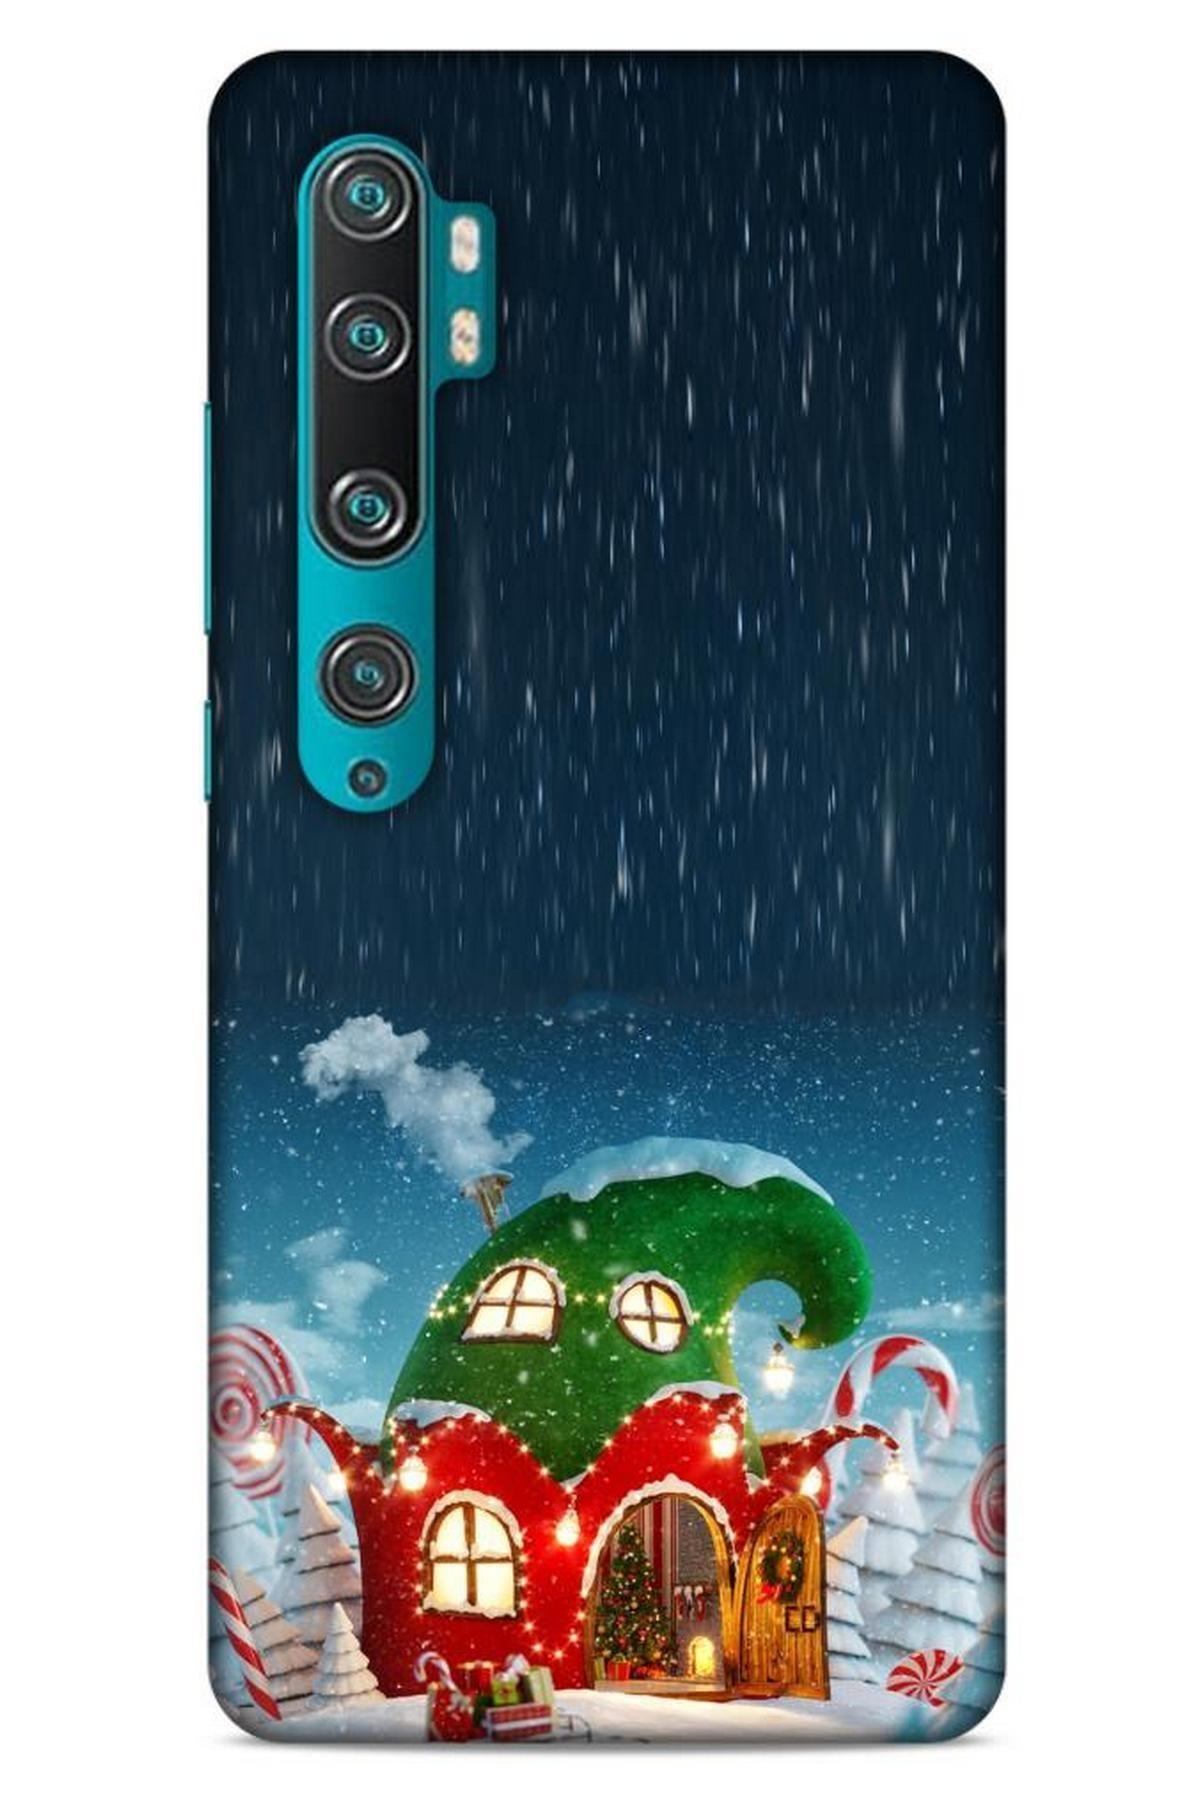 Lopard Xiaomi Mi Note 10 Pro Kılıf Snowix (7) Telefon Kılıfı Koyu Yeşil 1